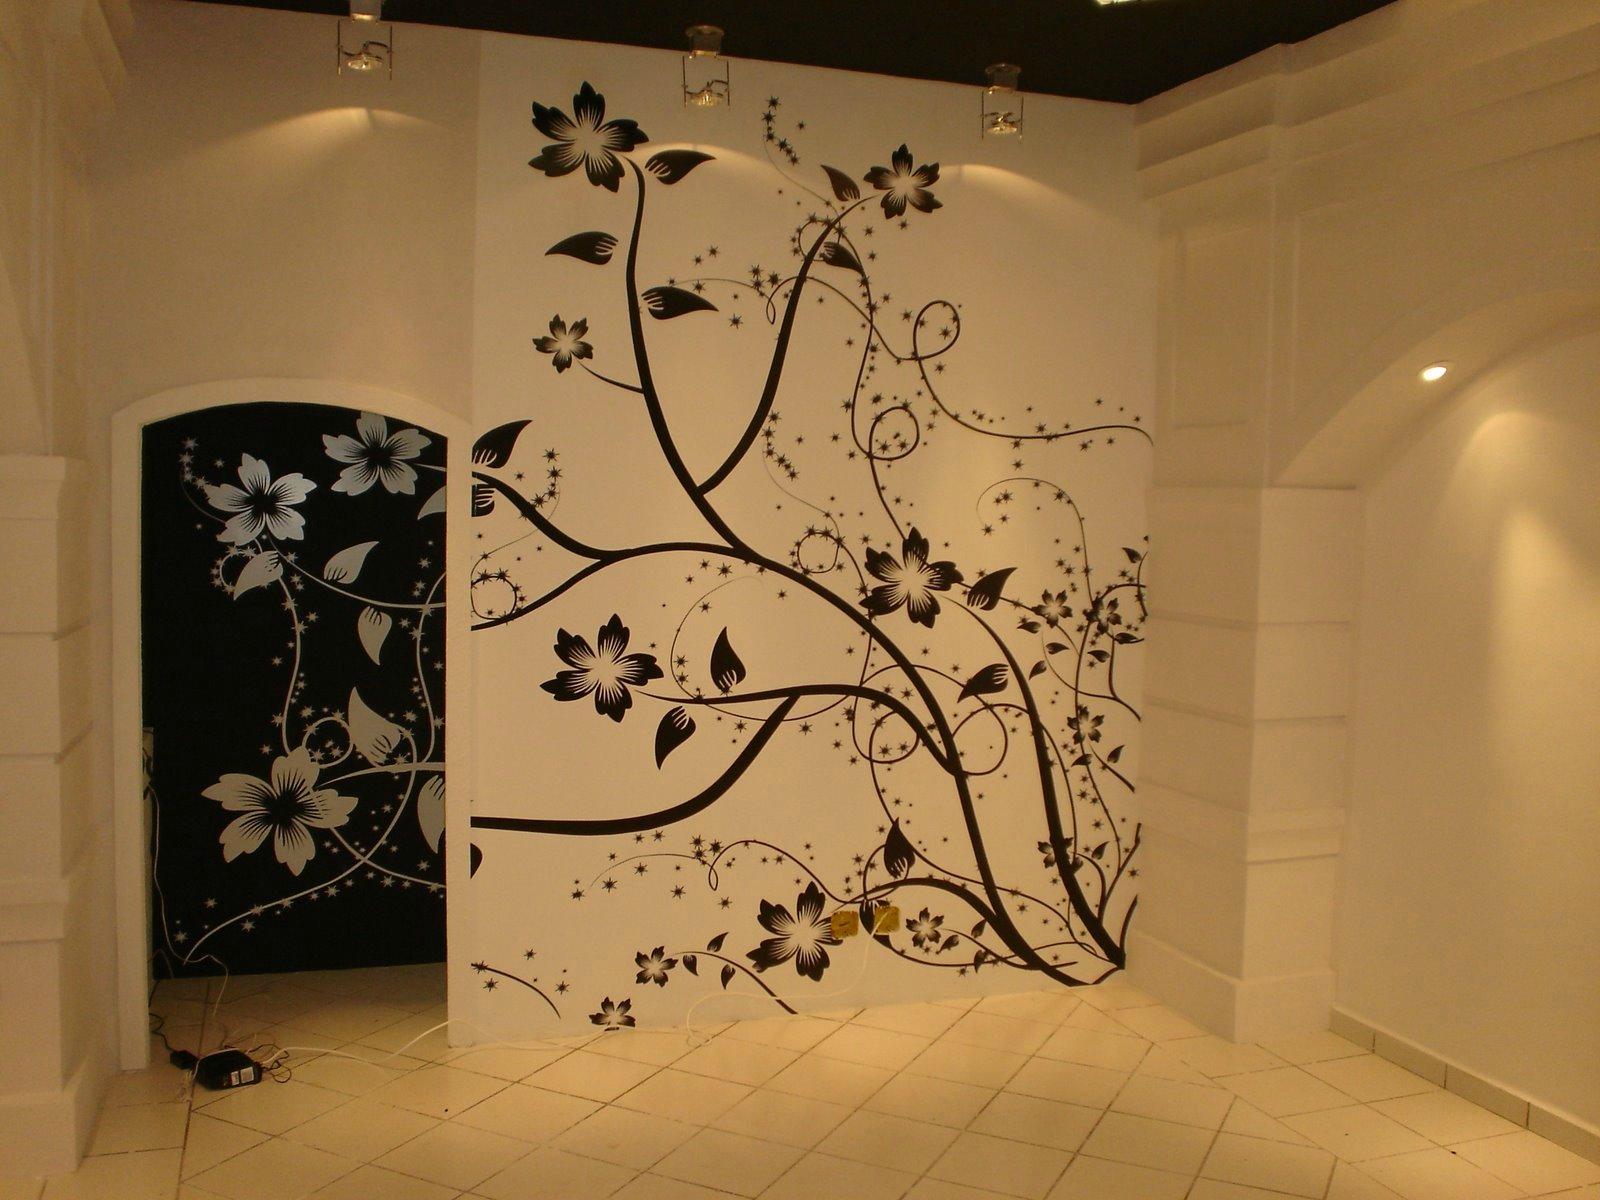 Трафареты и рисунки на стене своими руками